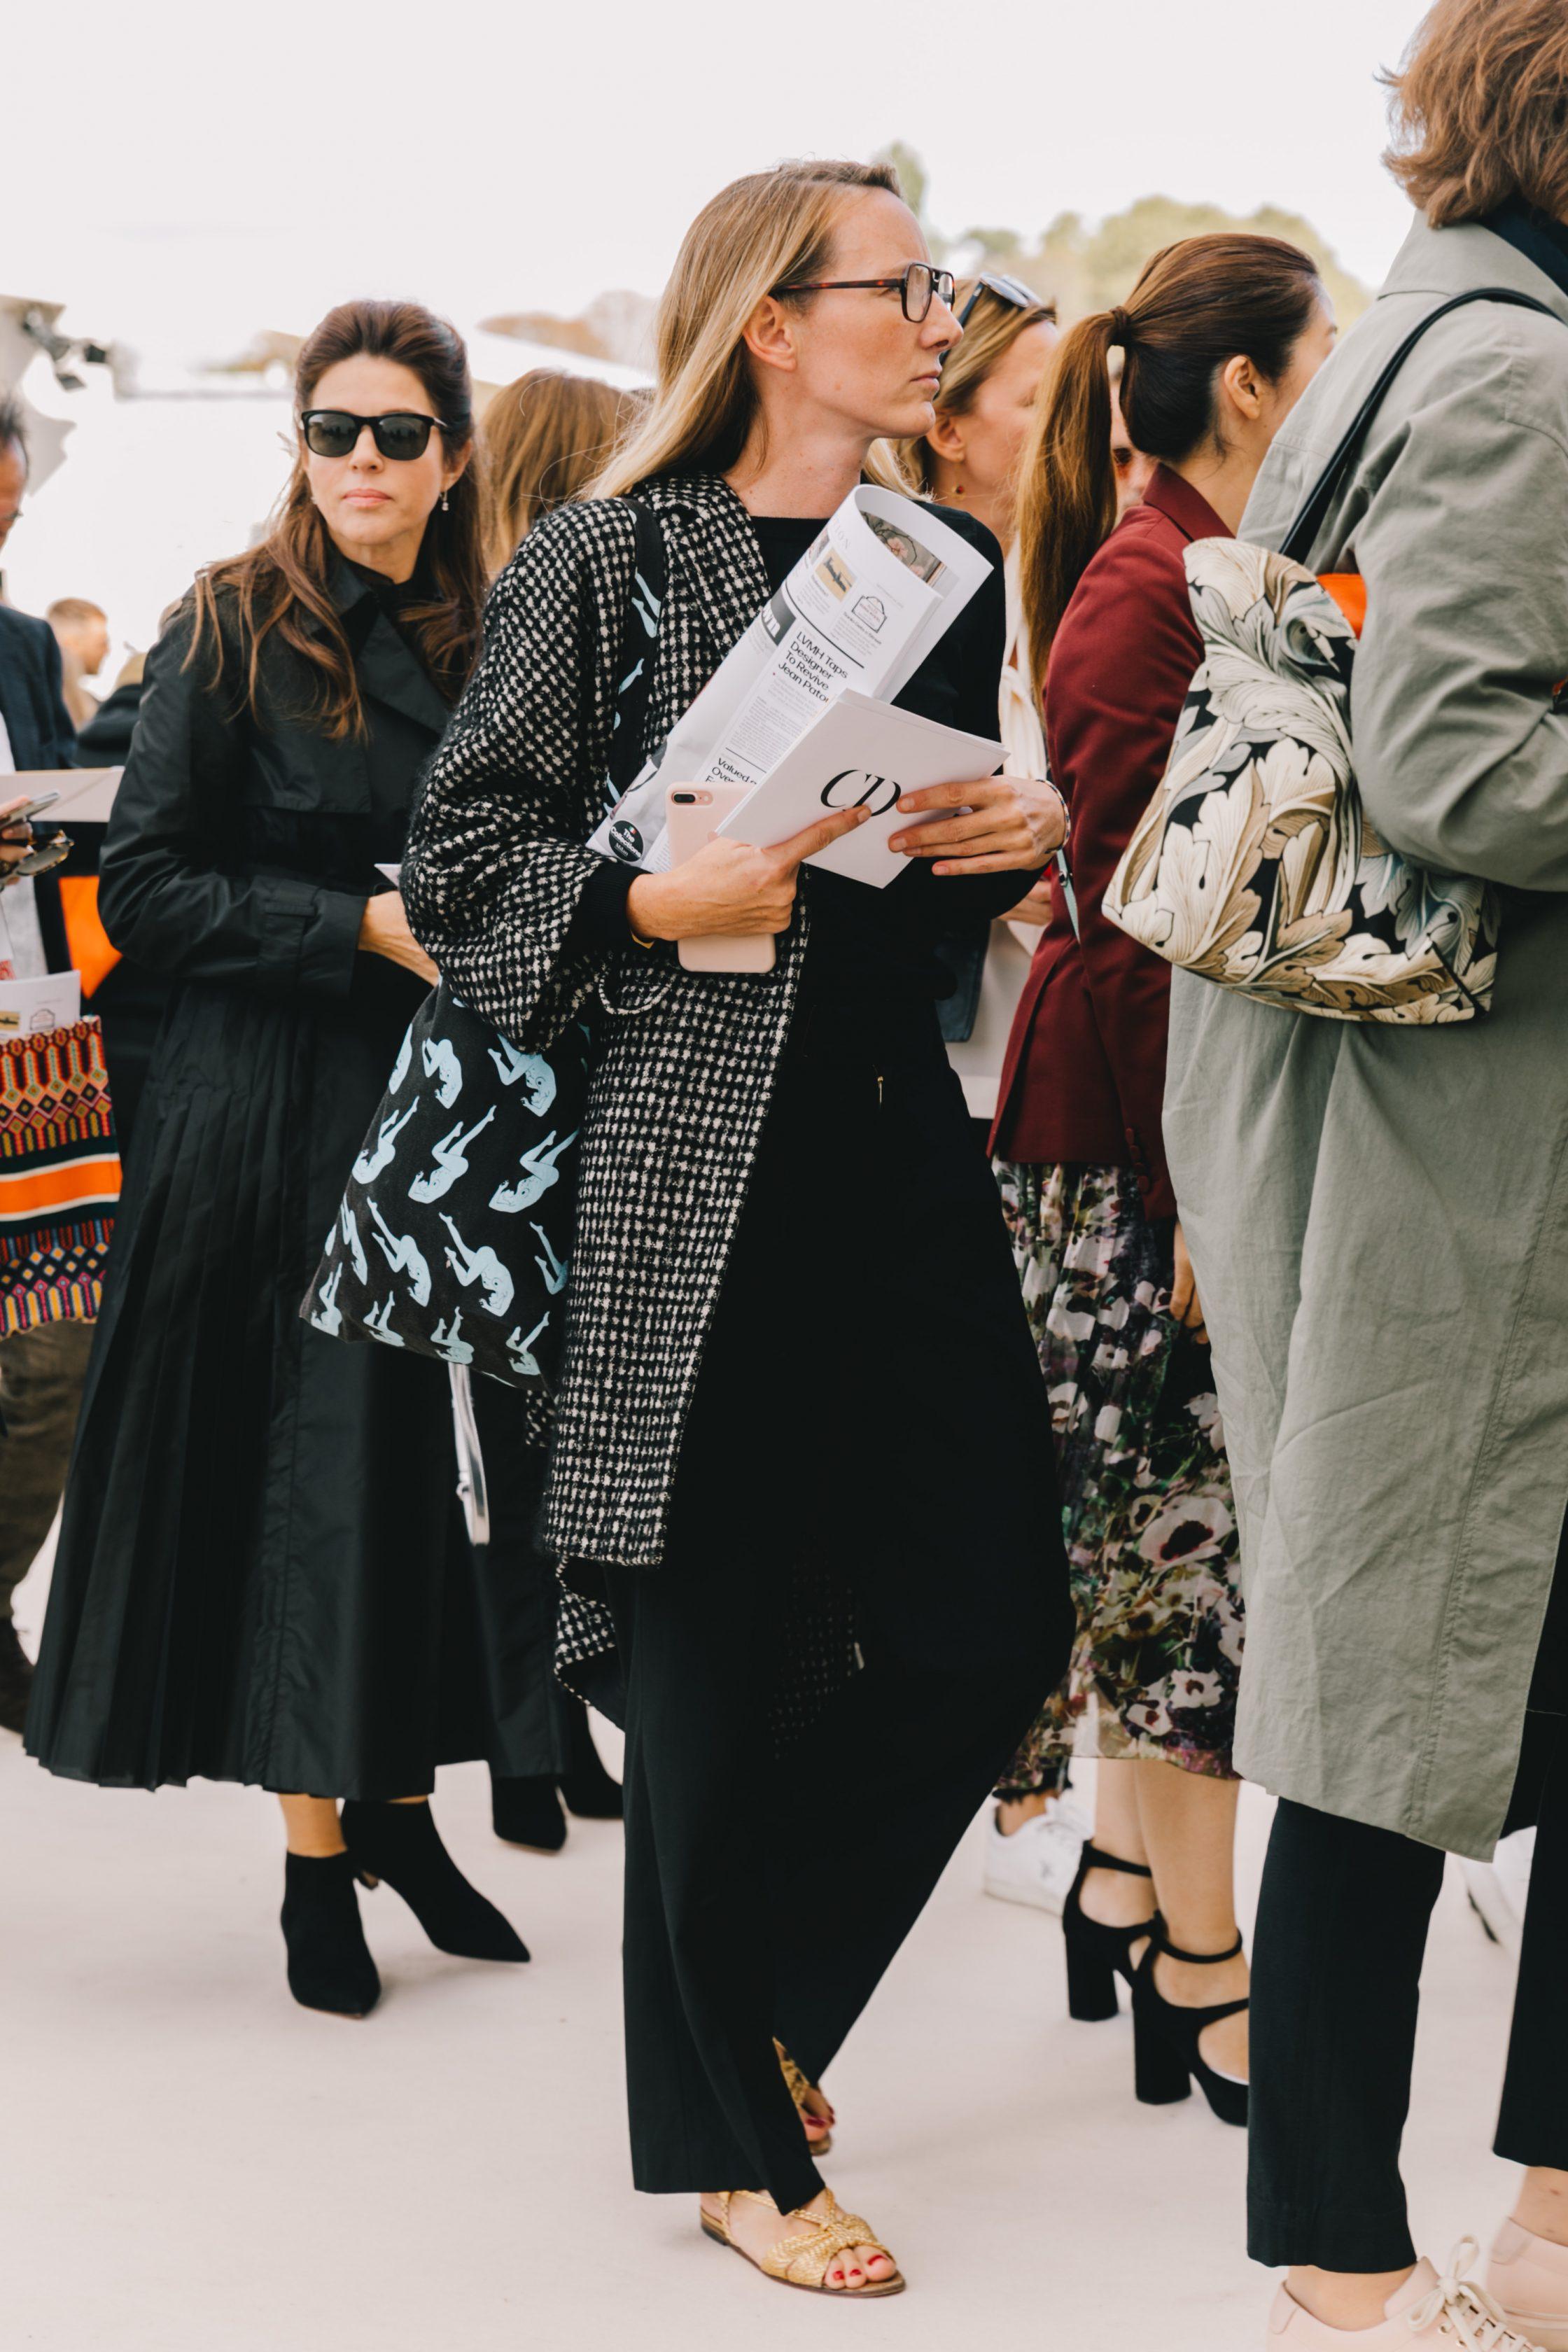 Paris Fashion Week September 2018 Street Style by Collage Vintage